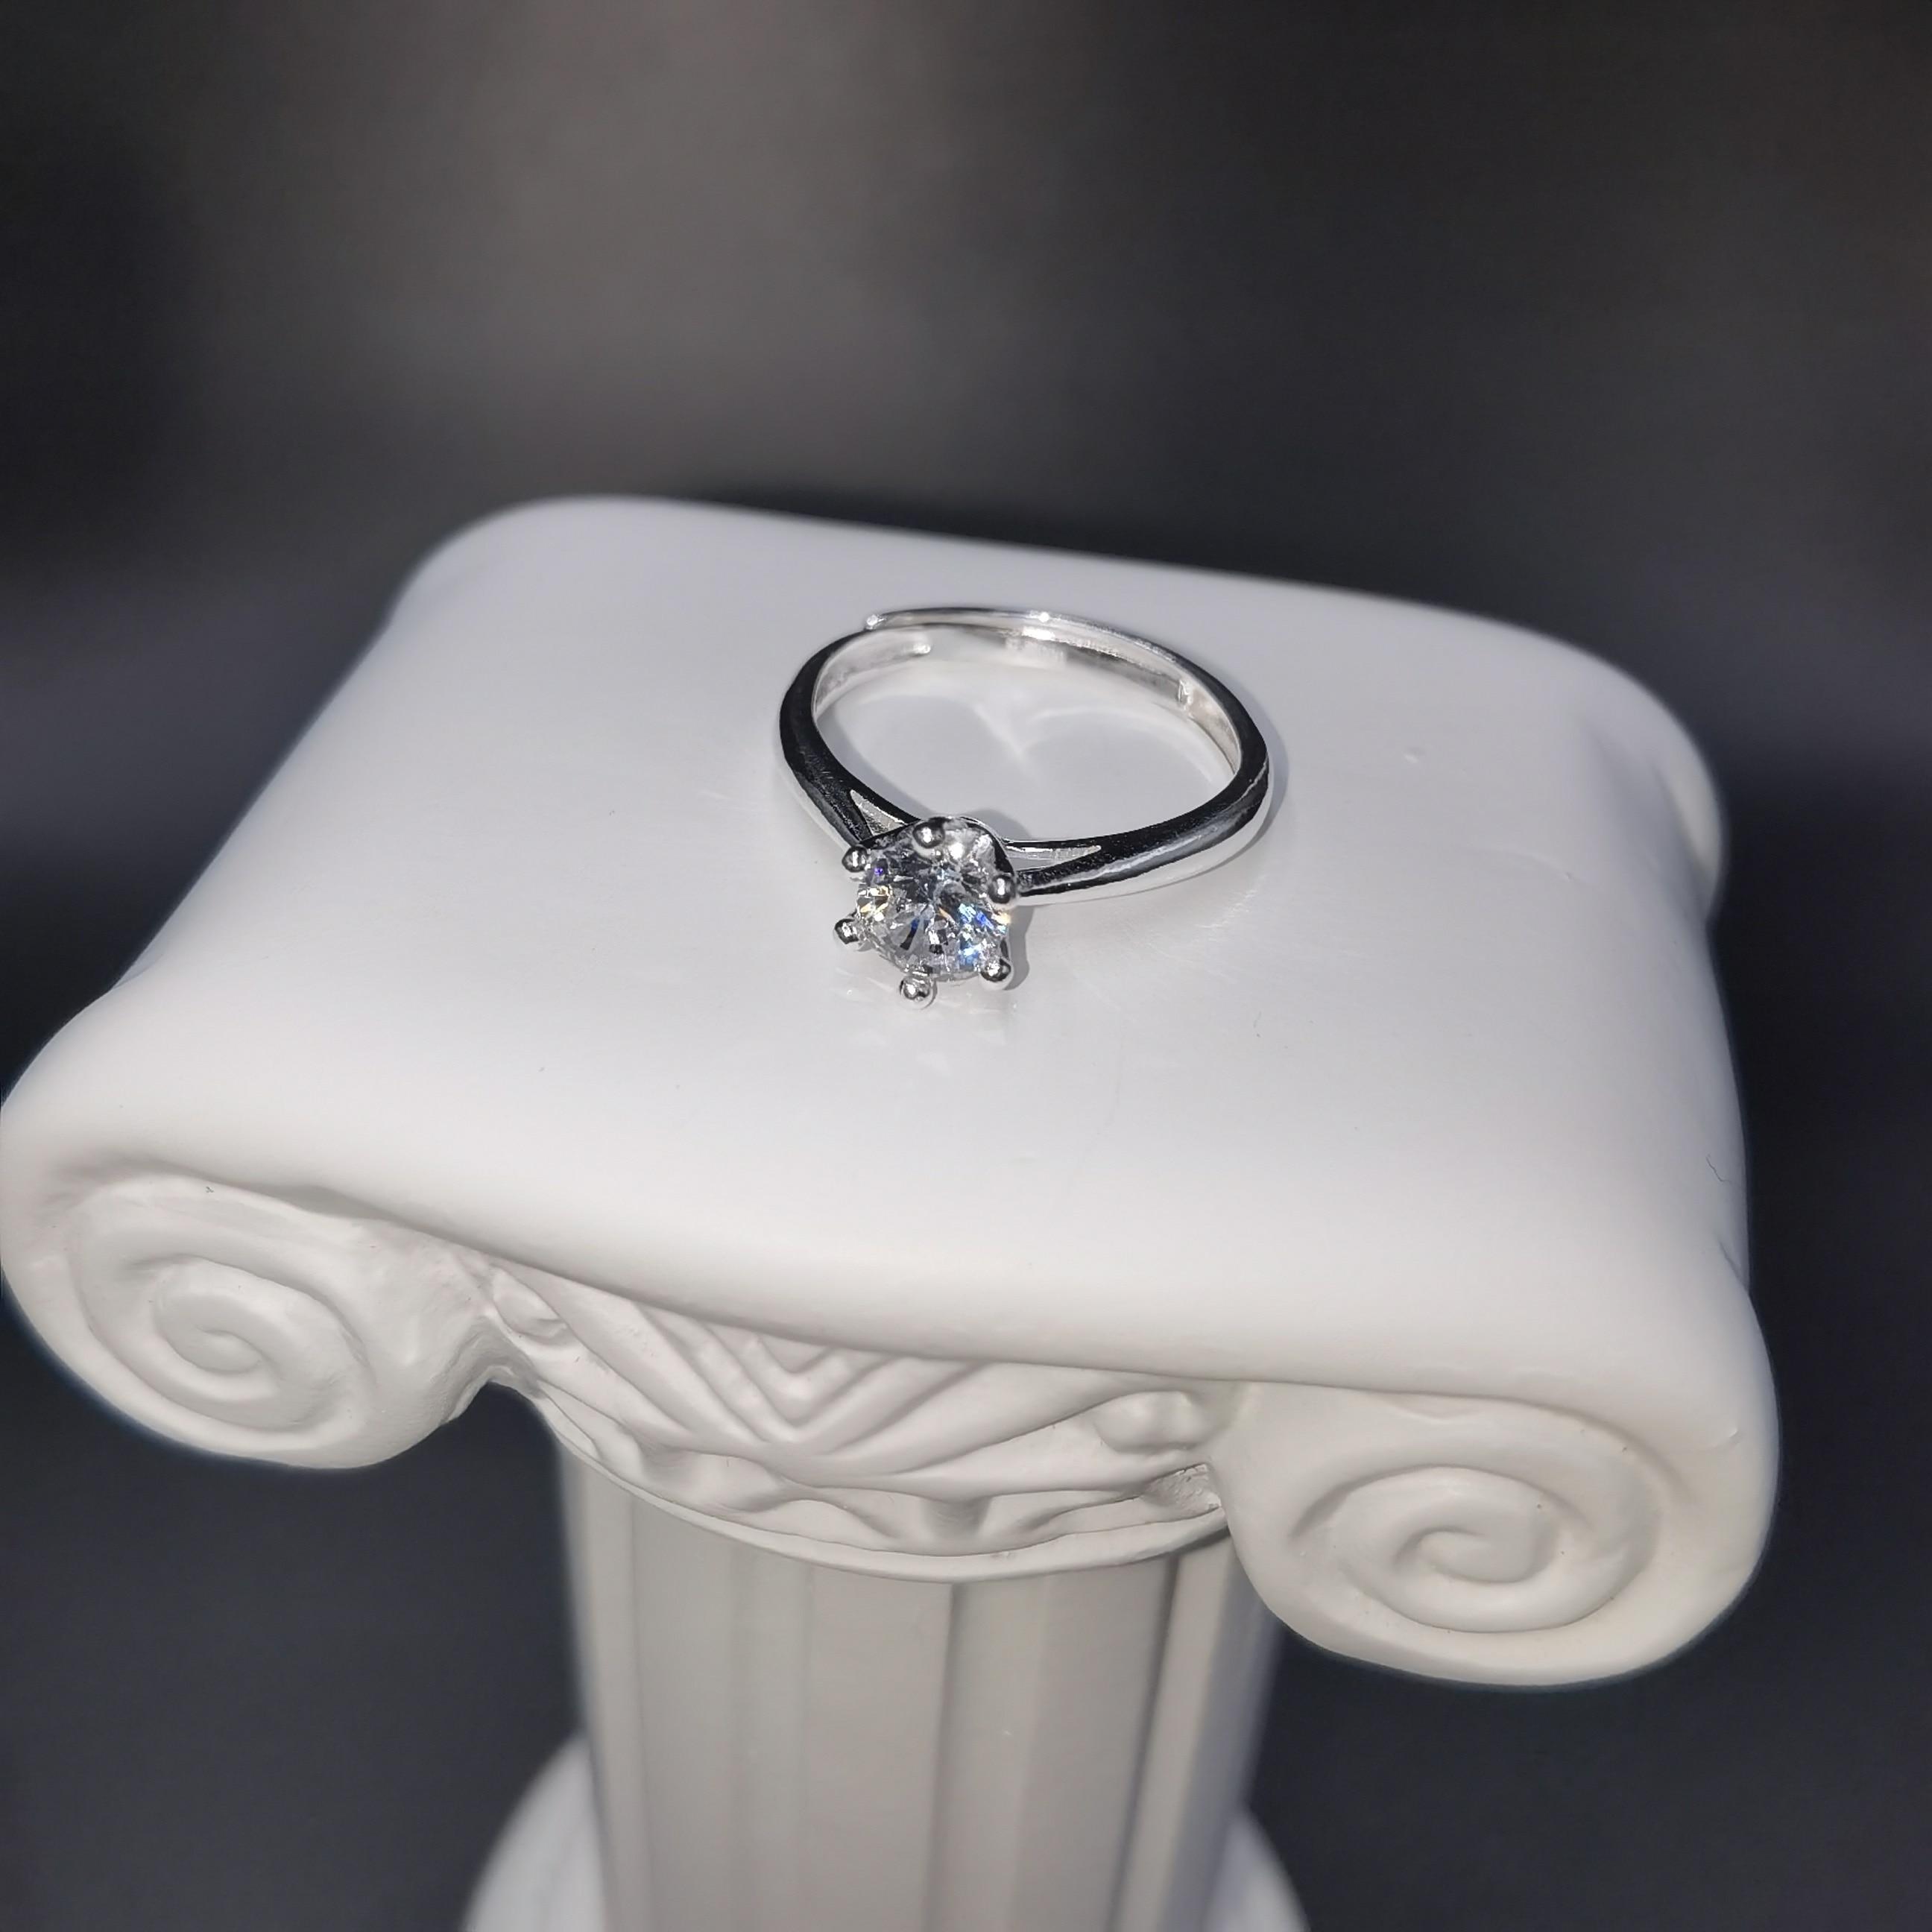 Classic Imitation Diamond Wedding Ring Sterling Silver 1 Carat Zircon Couples Propose Glamorous Female Jewelry Gift Adjustable